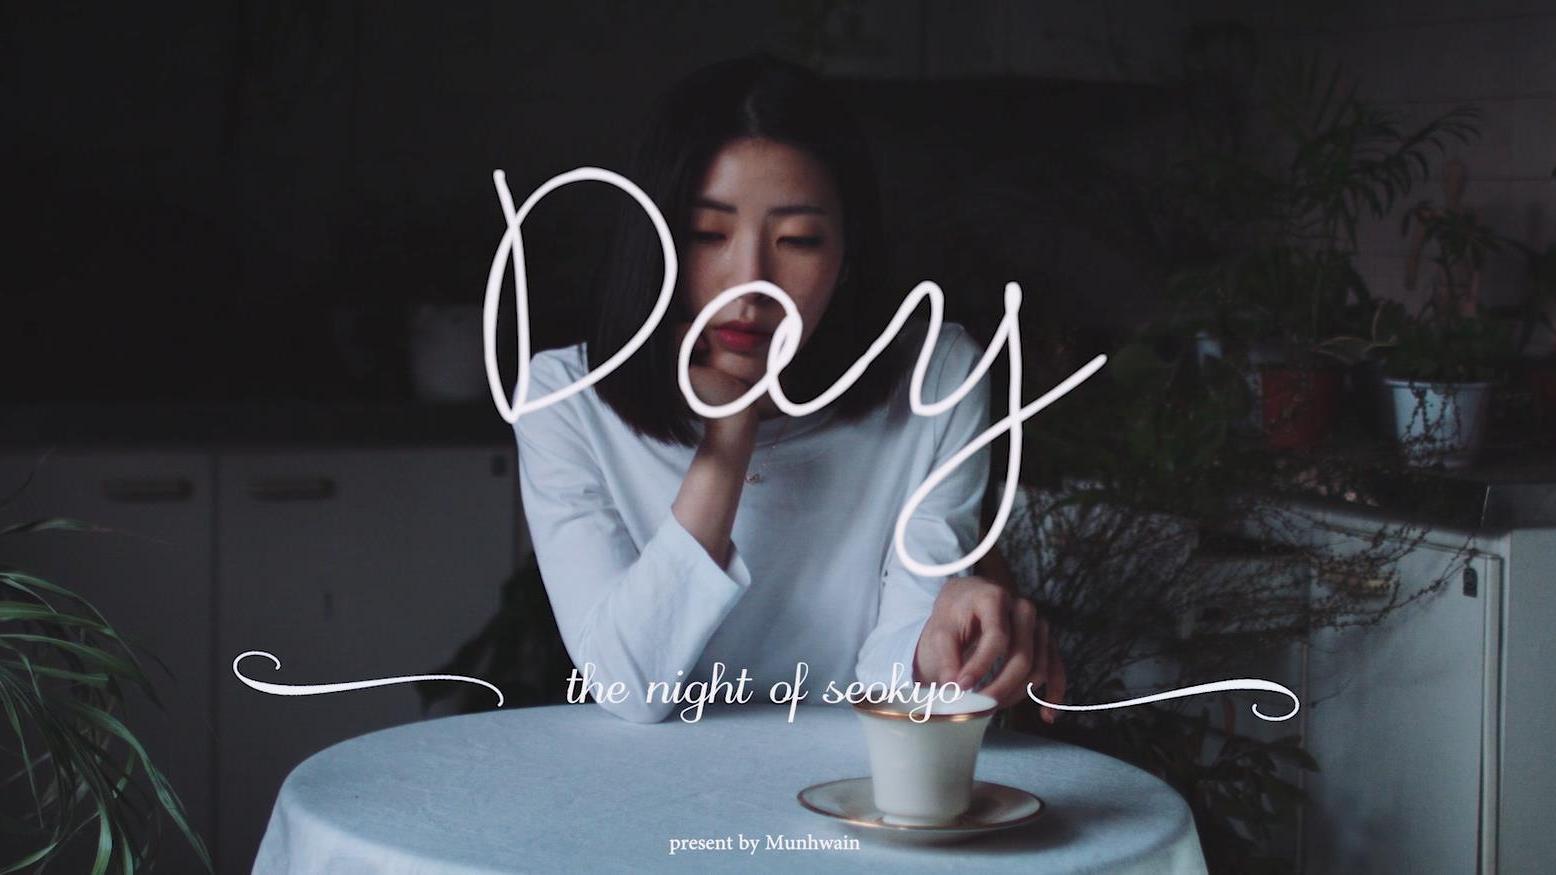 [MV] 서교동의 밤 - Day (feat. 다원)